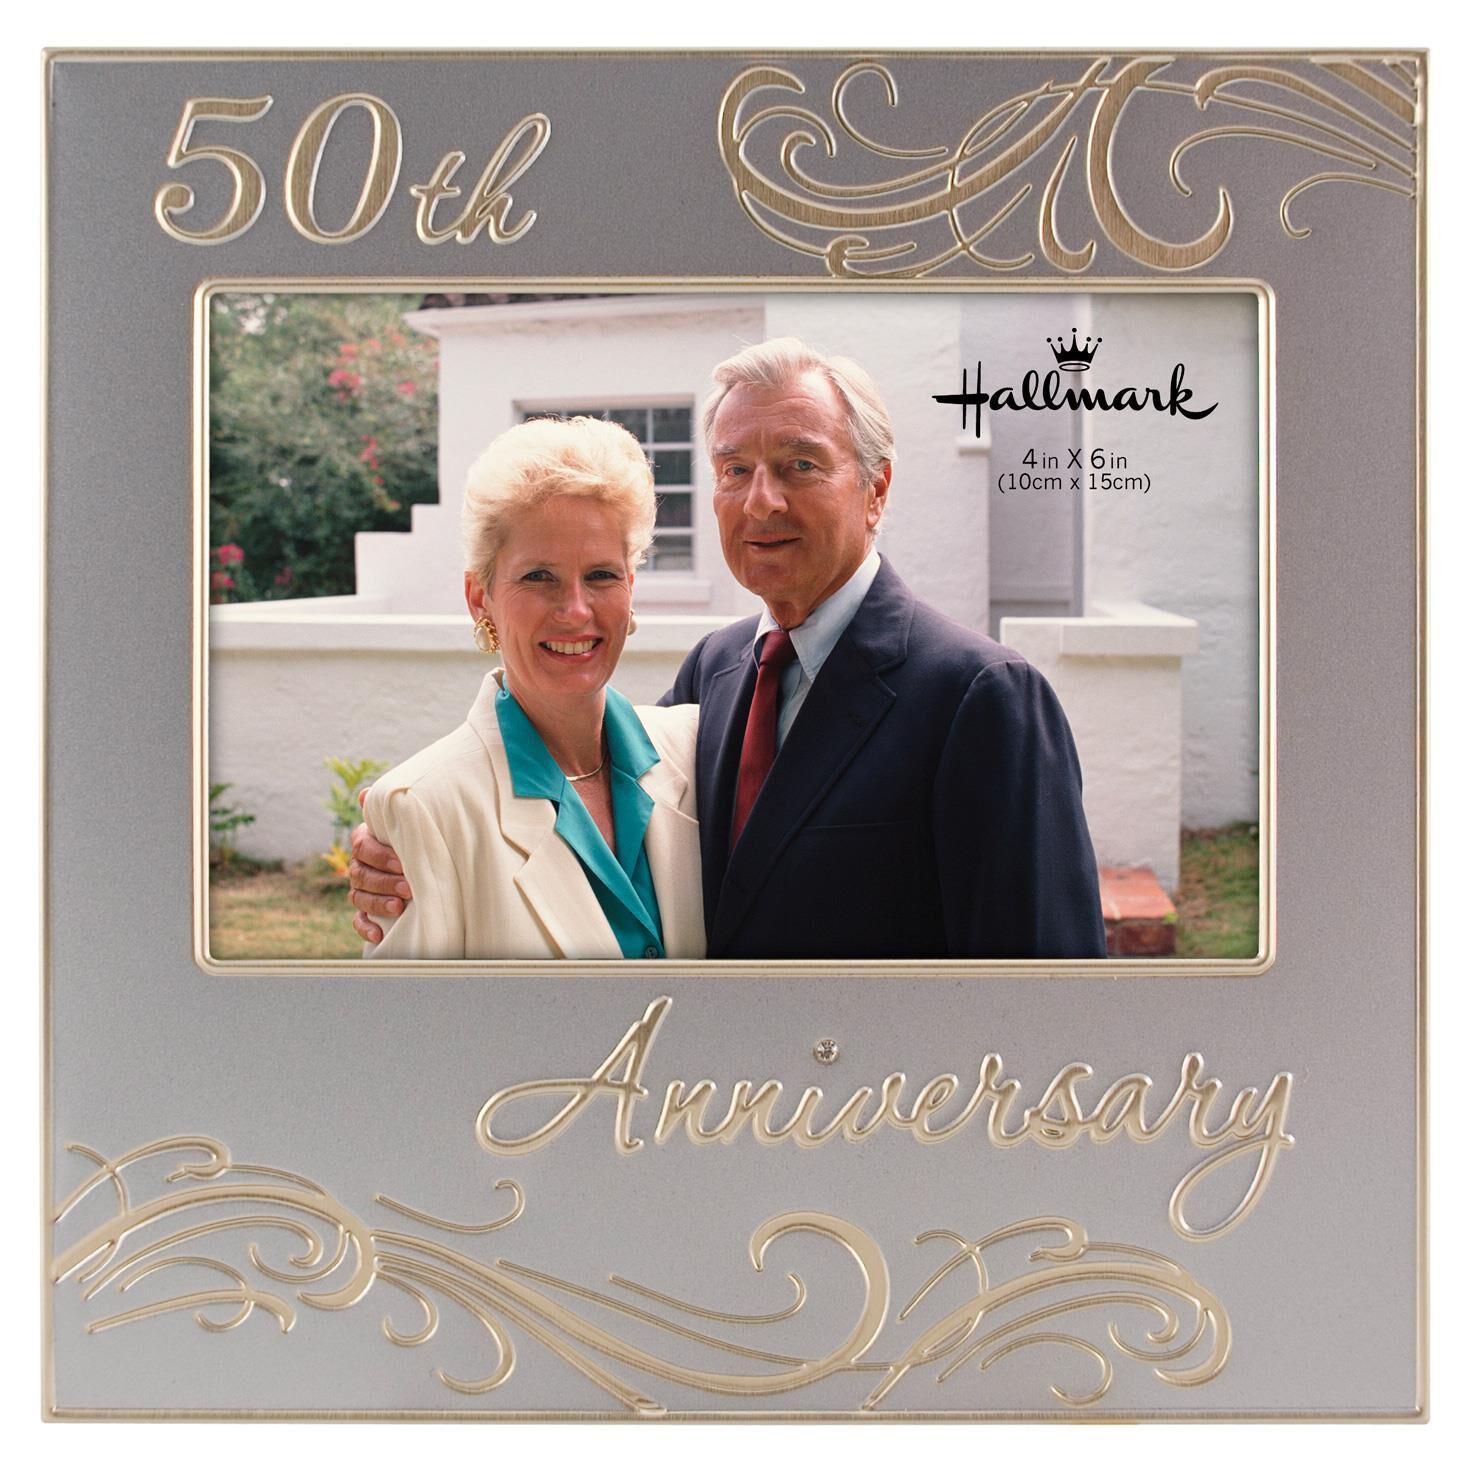 50th anniversary silver metal photo frame 4x6 picture frames hallmark